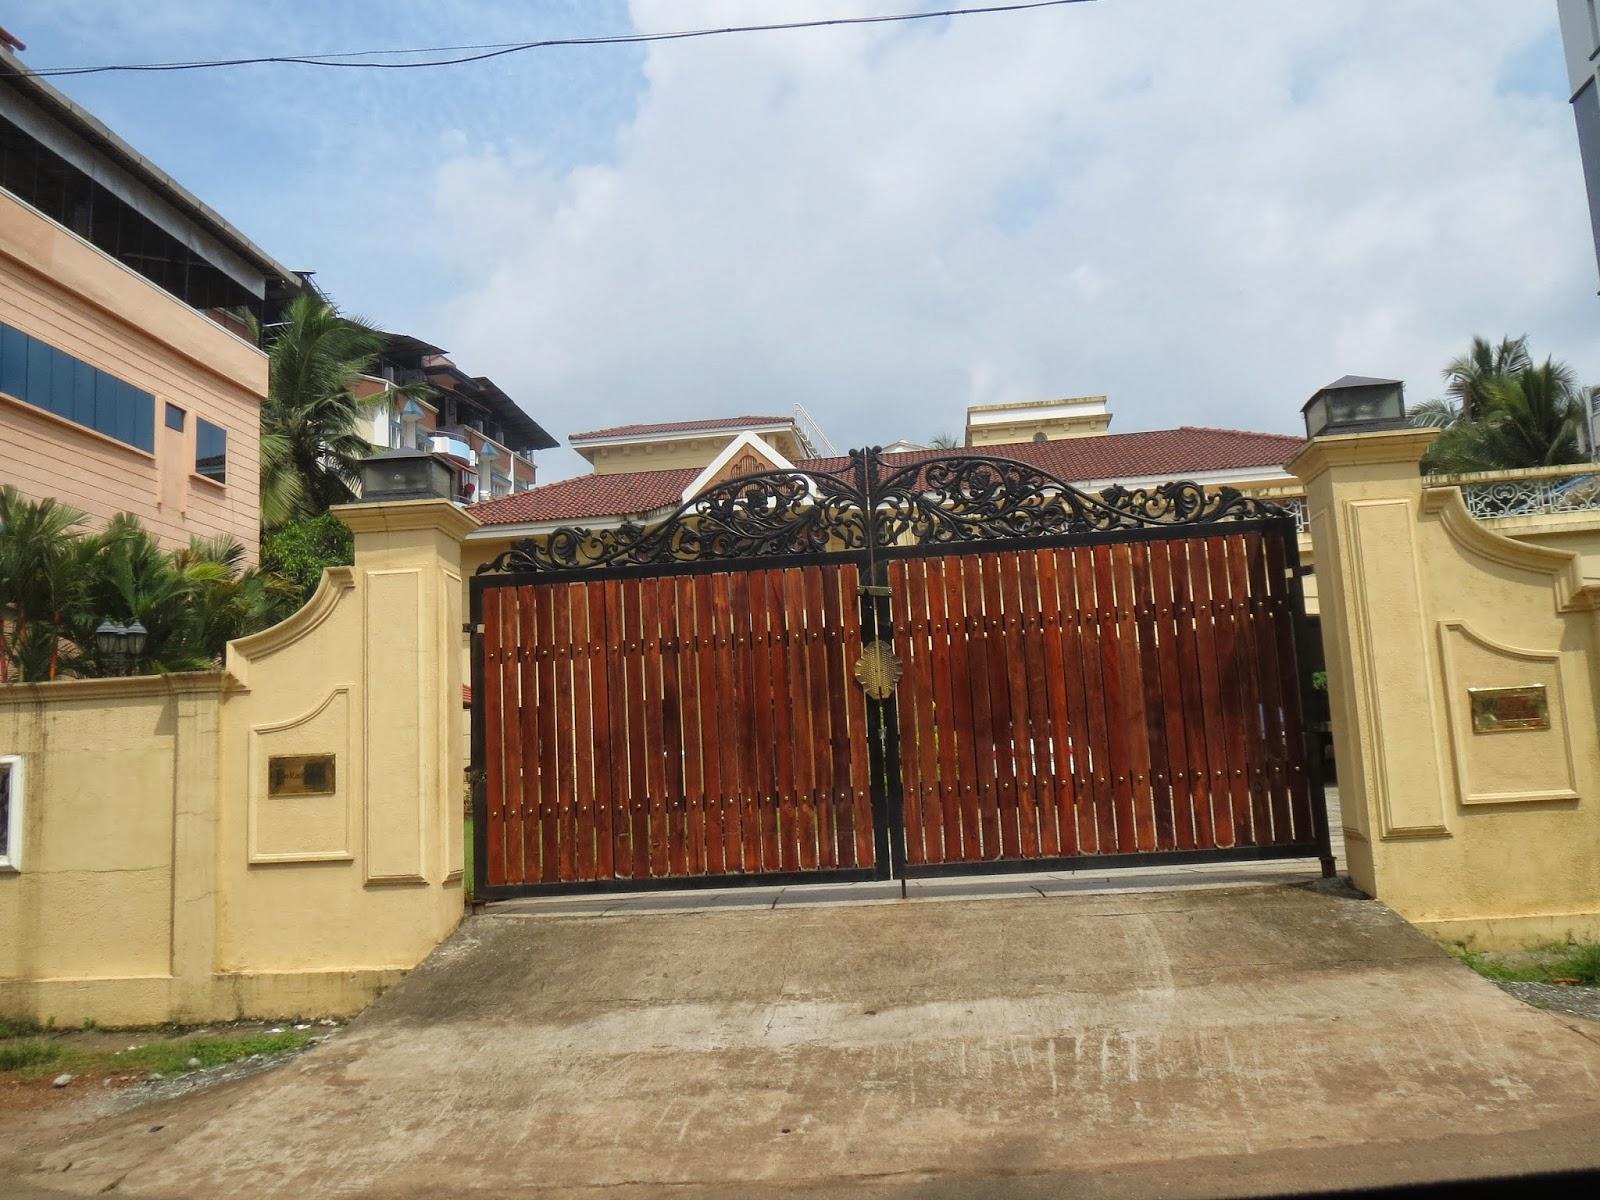 Kerala Gate Designs: Different types of gates in Kerala